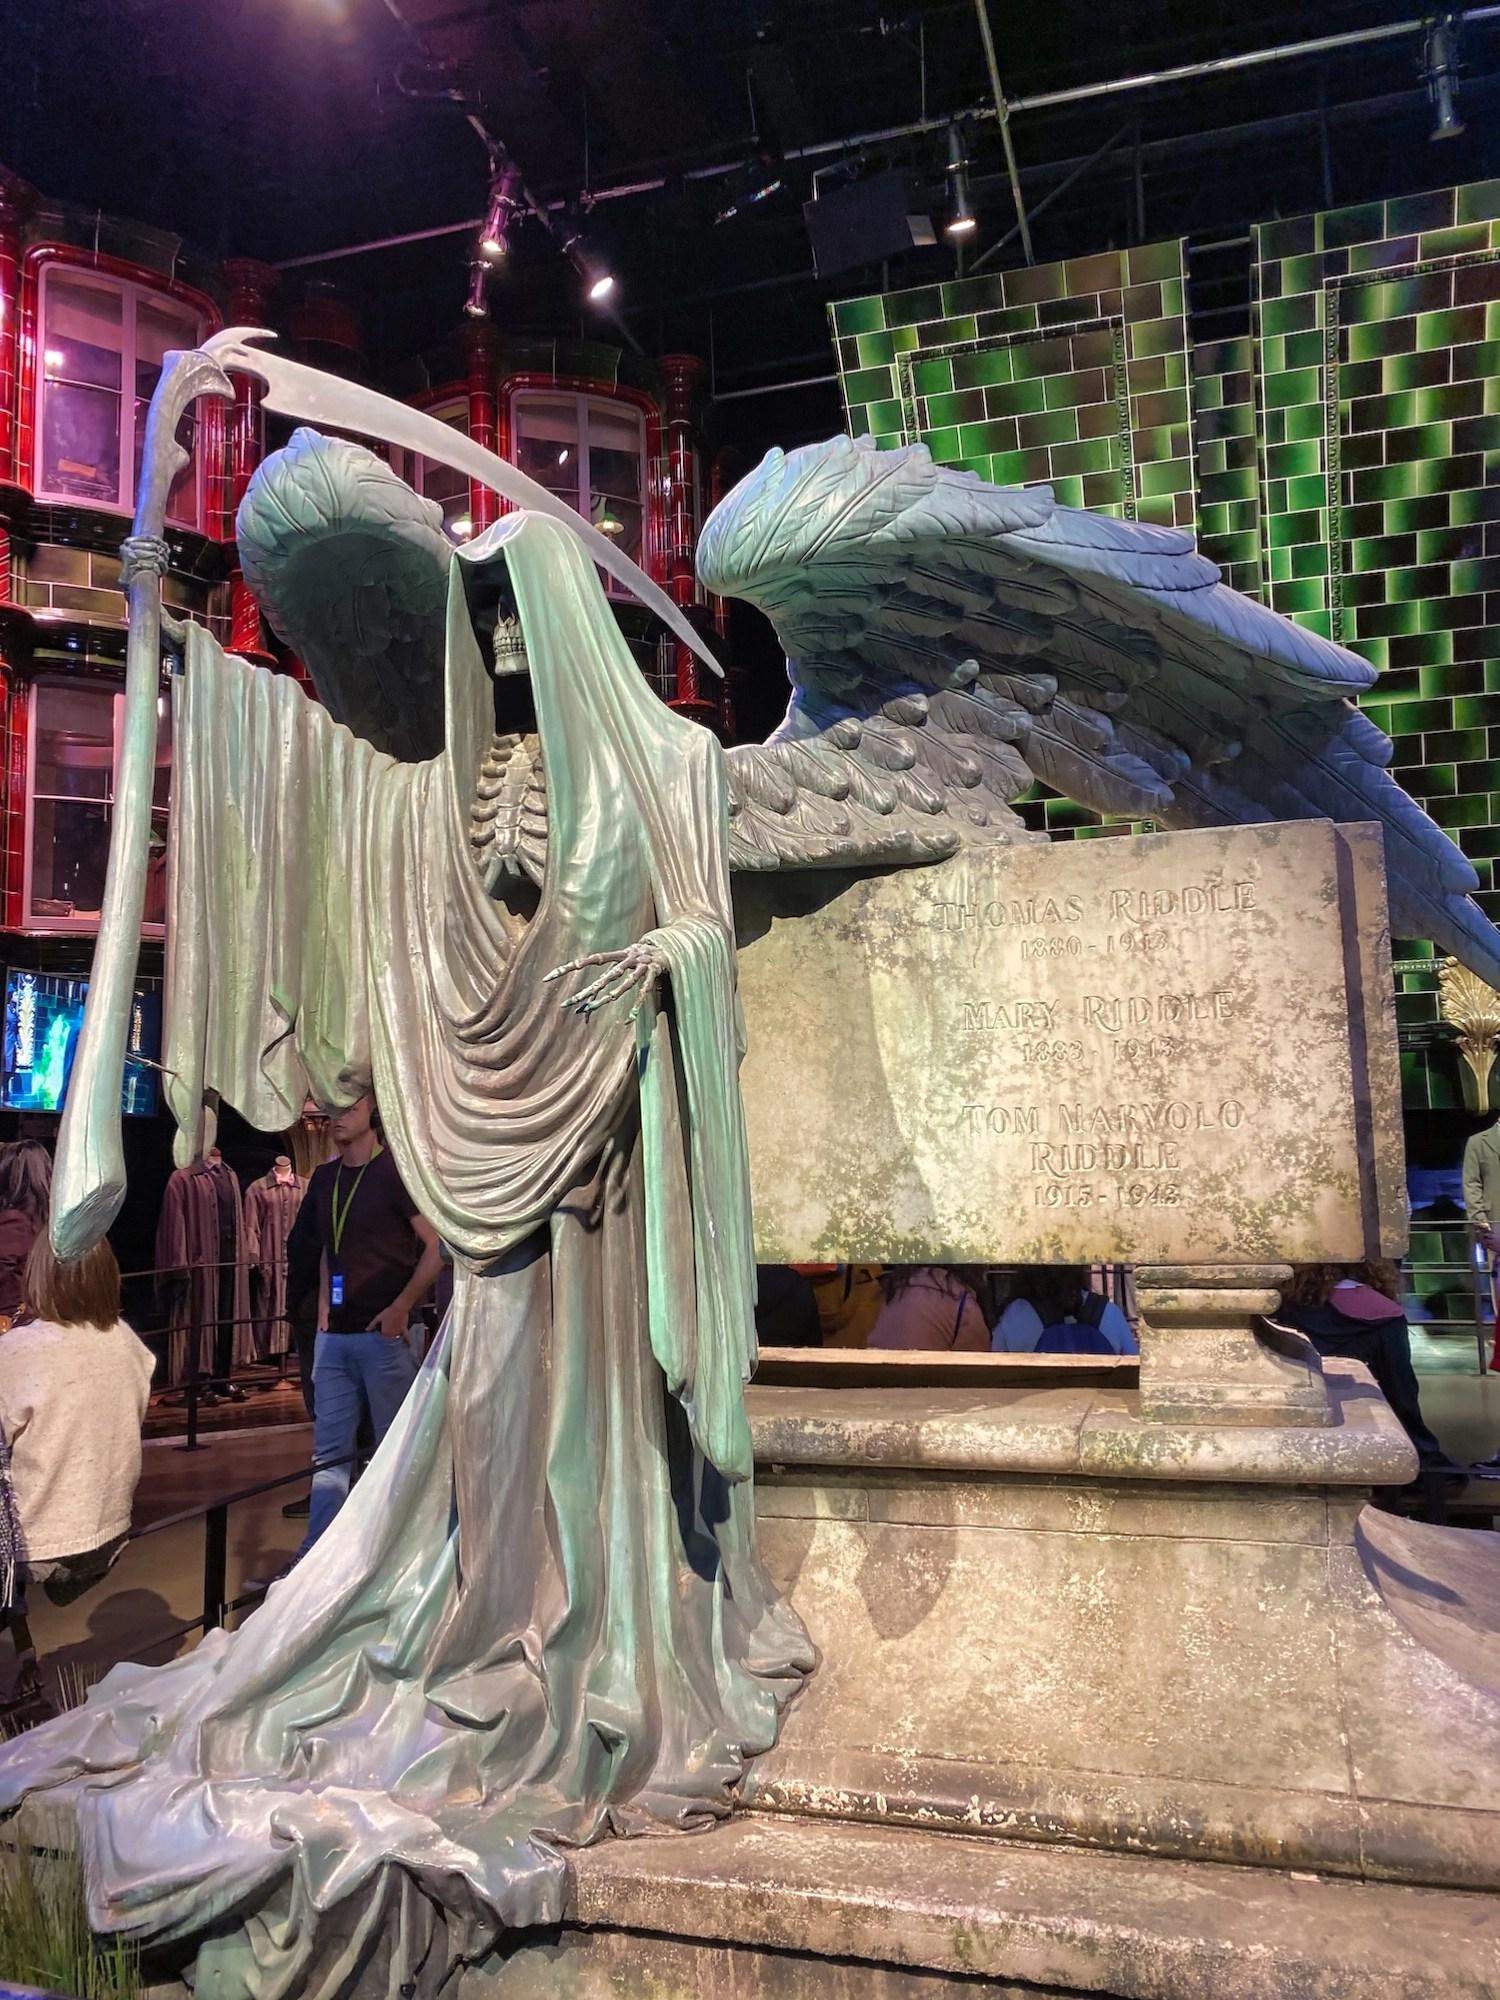 Harry Potter Studio Tour - Riddle's Tomb